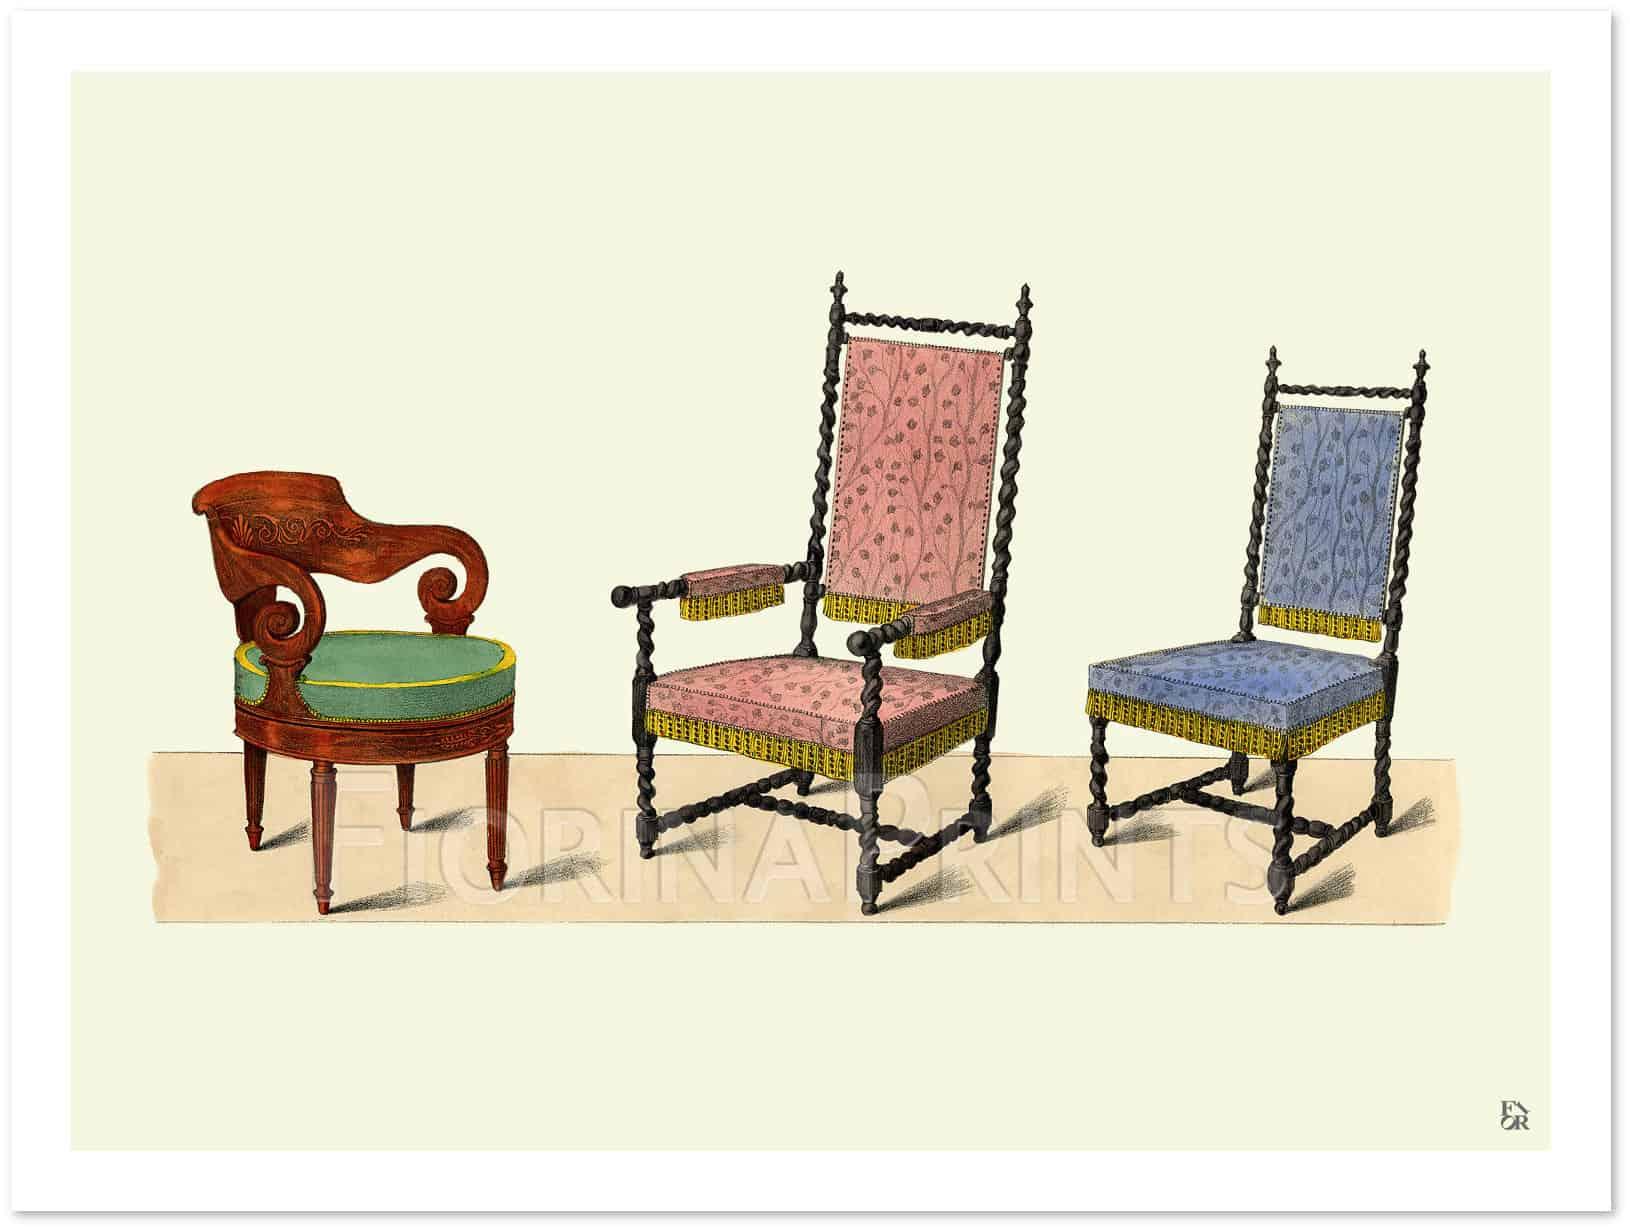 Chairs-armchairs-XII-shadow.jpg